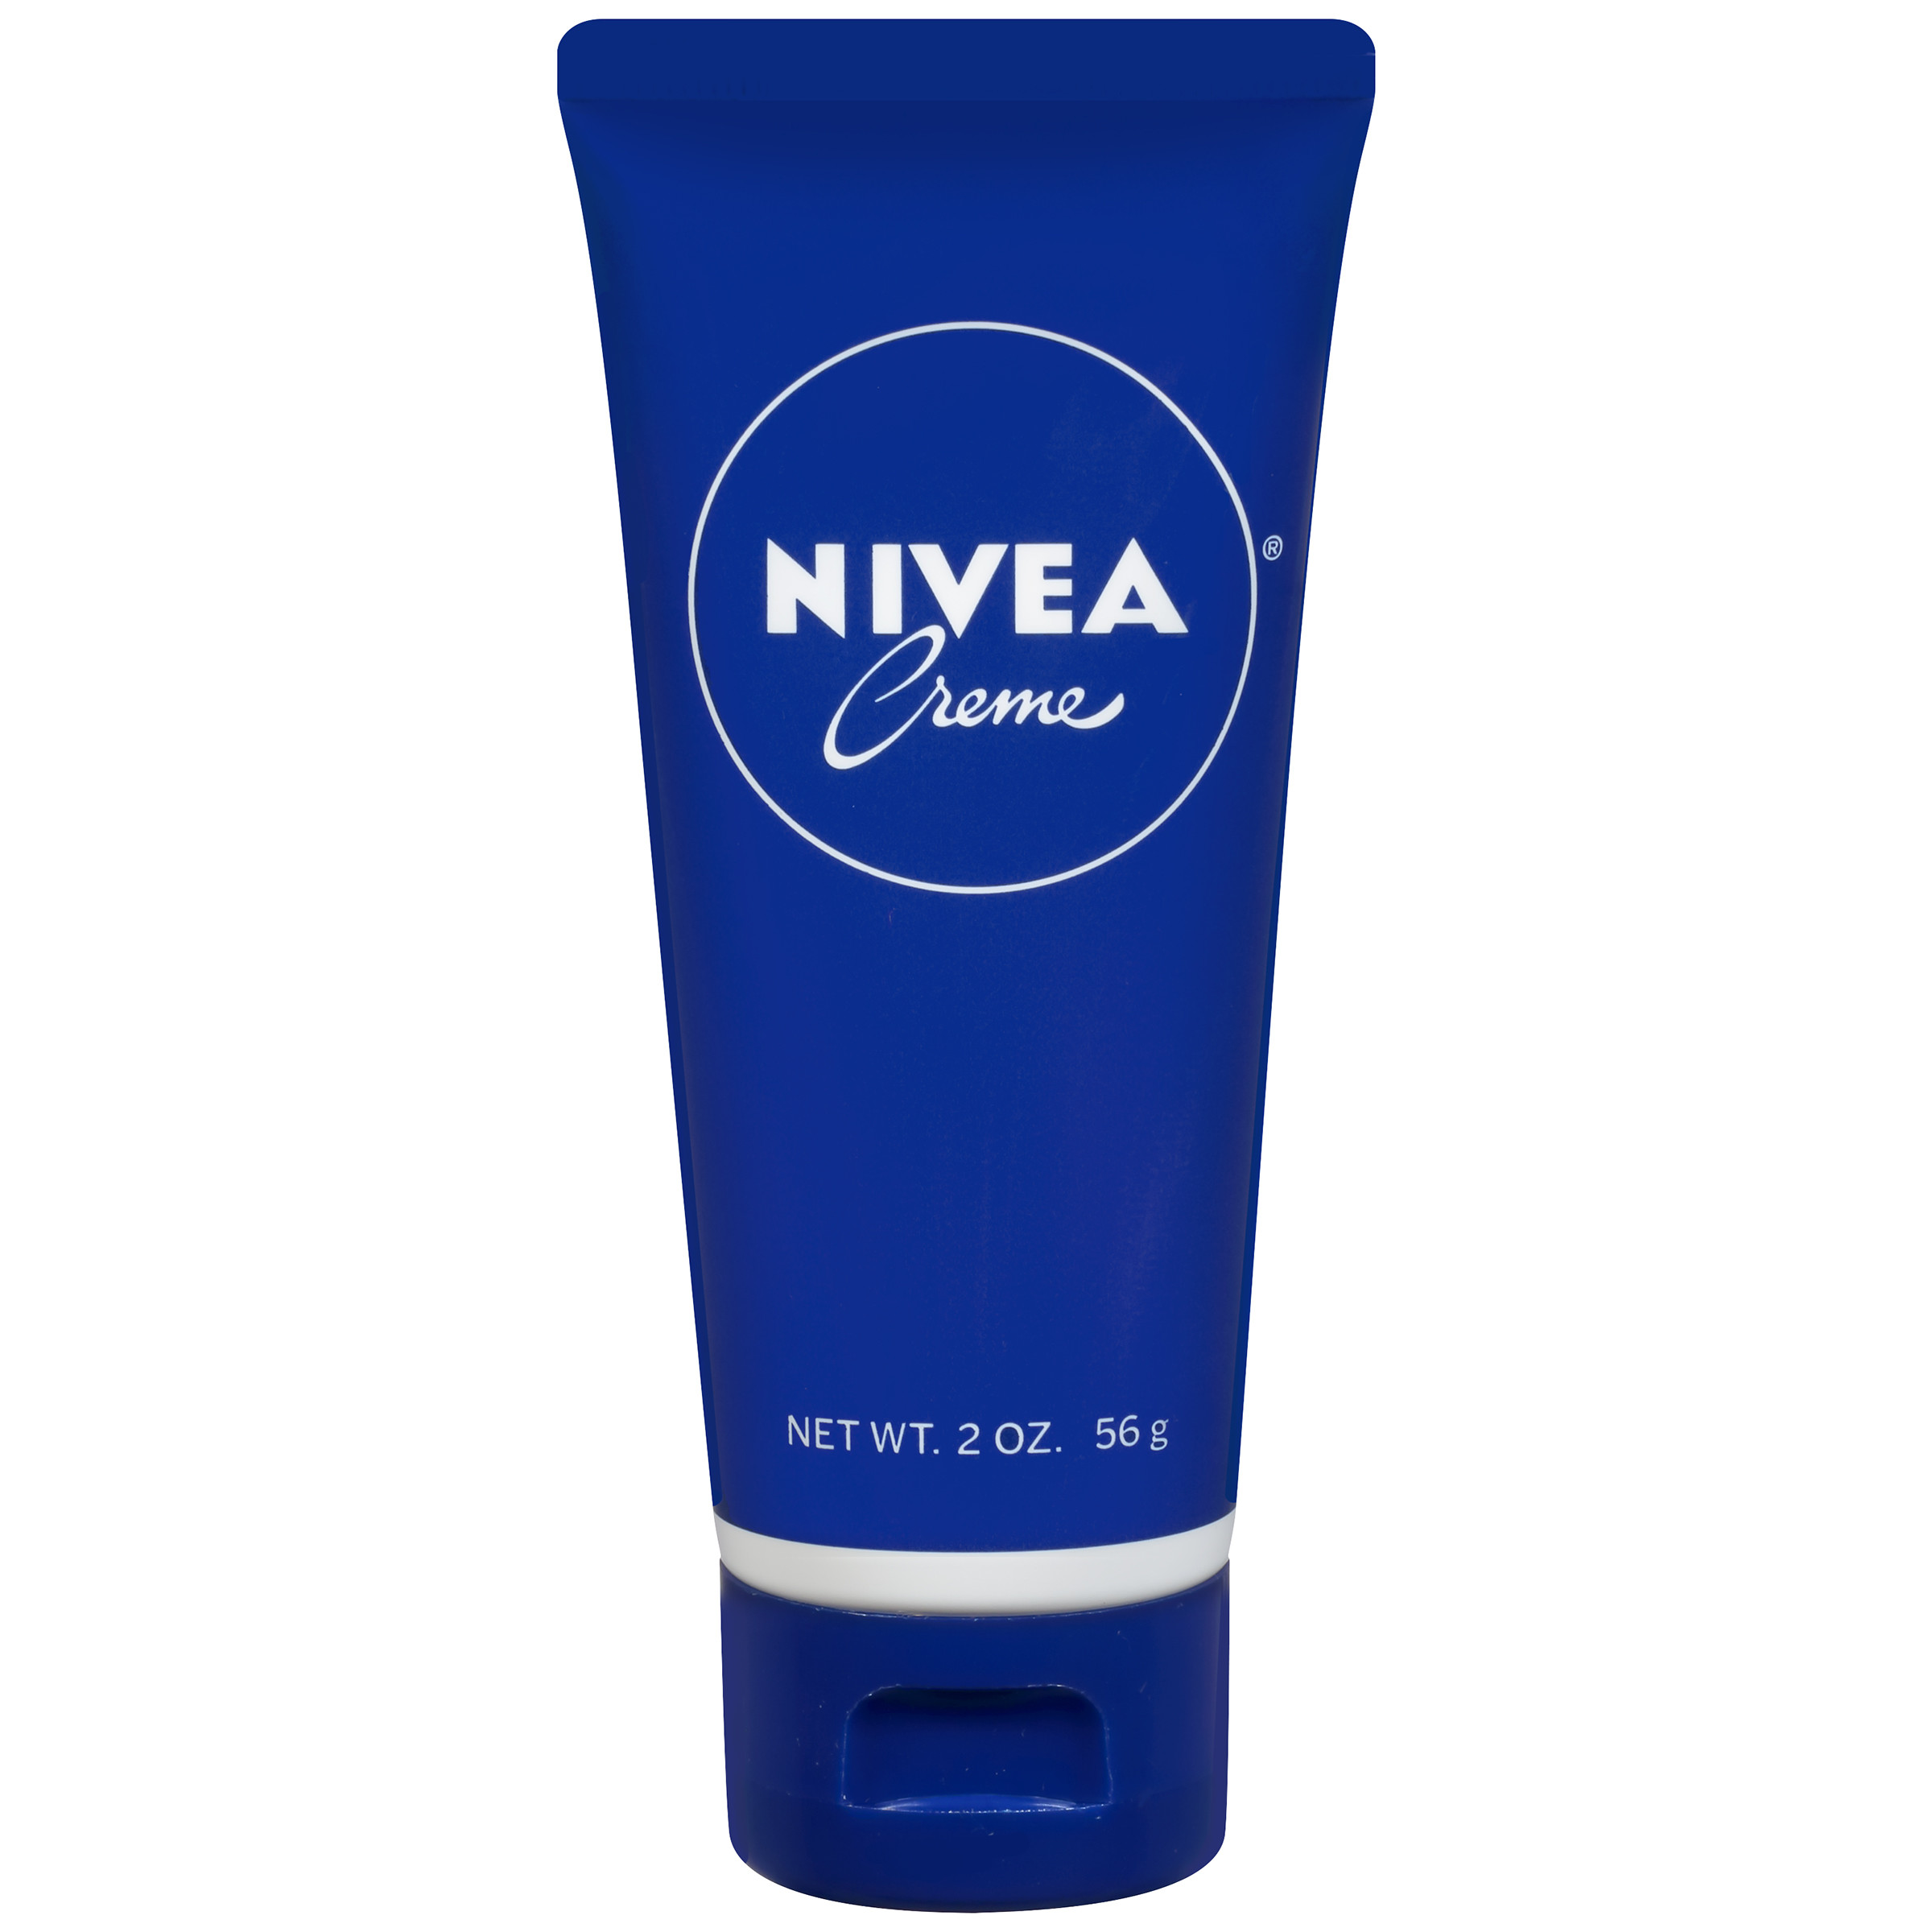 NIVEA Creme 2 oz. - Walmart.com